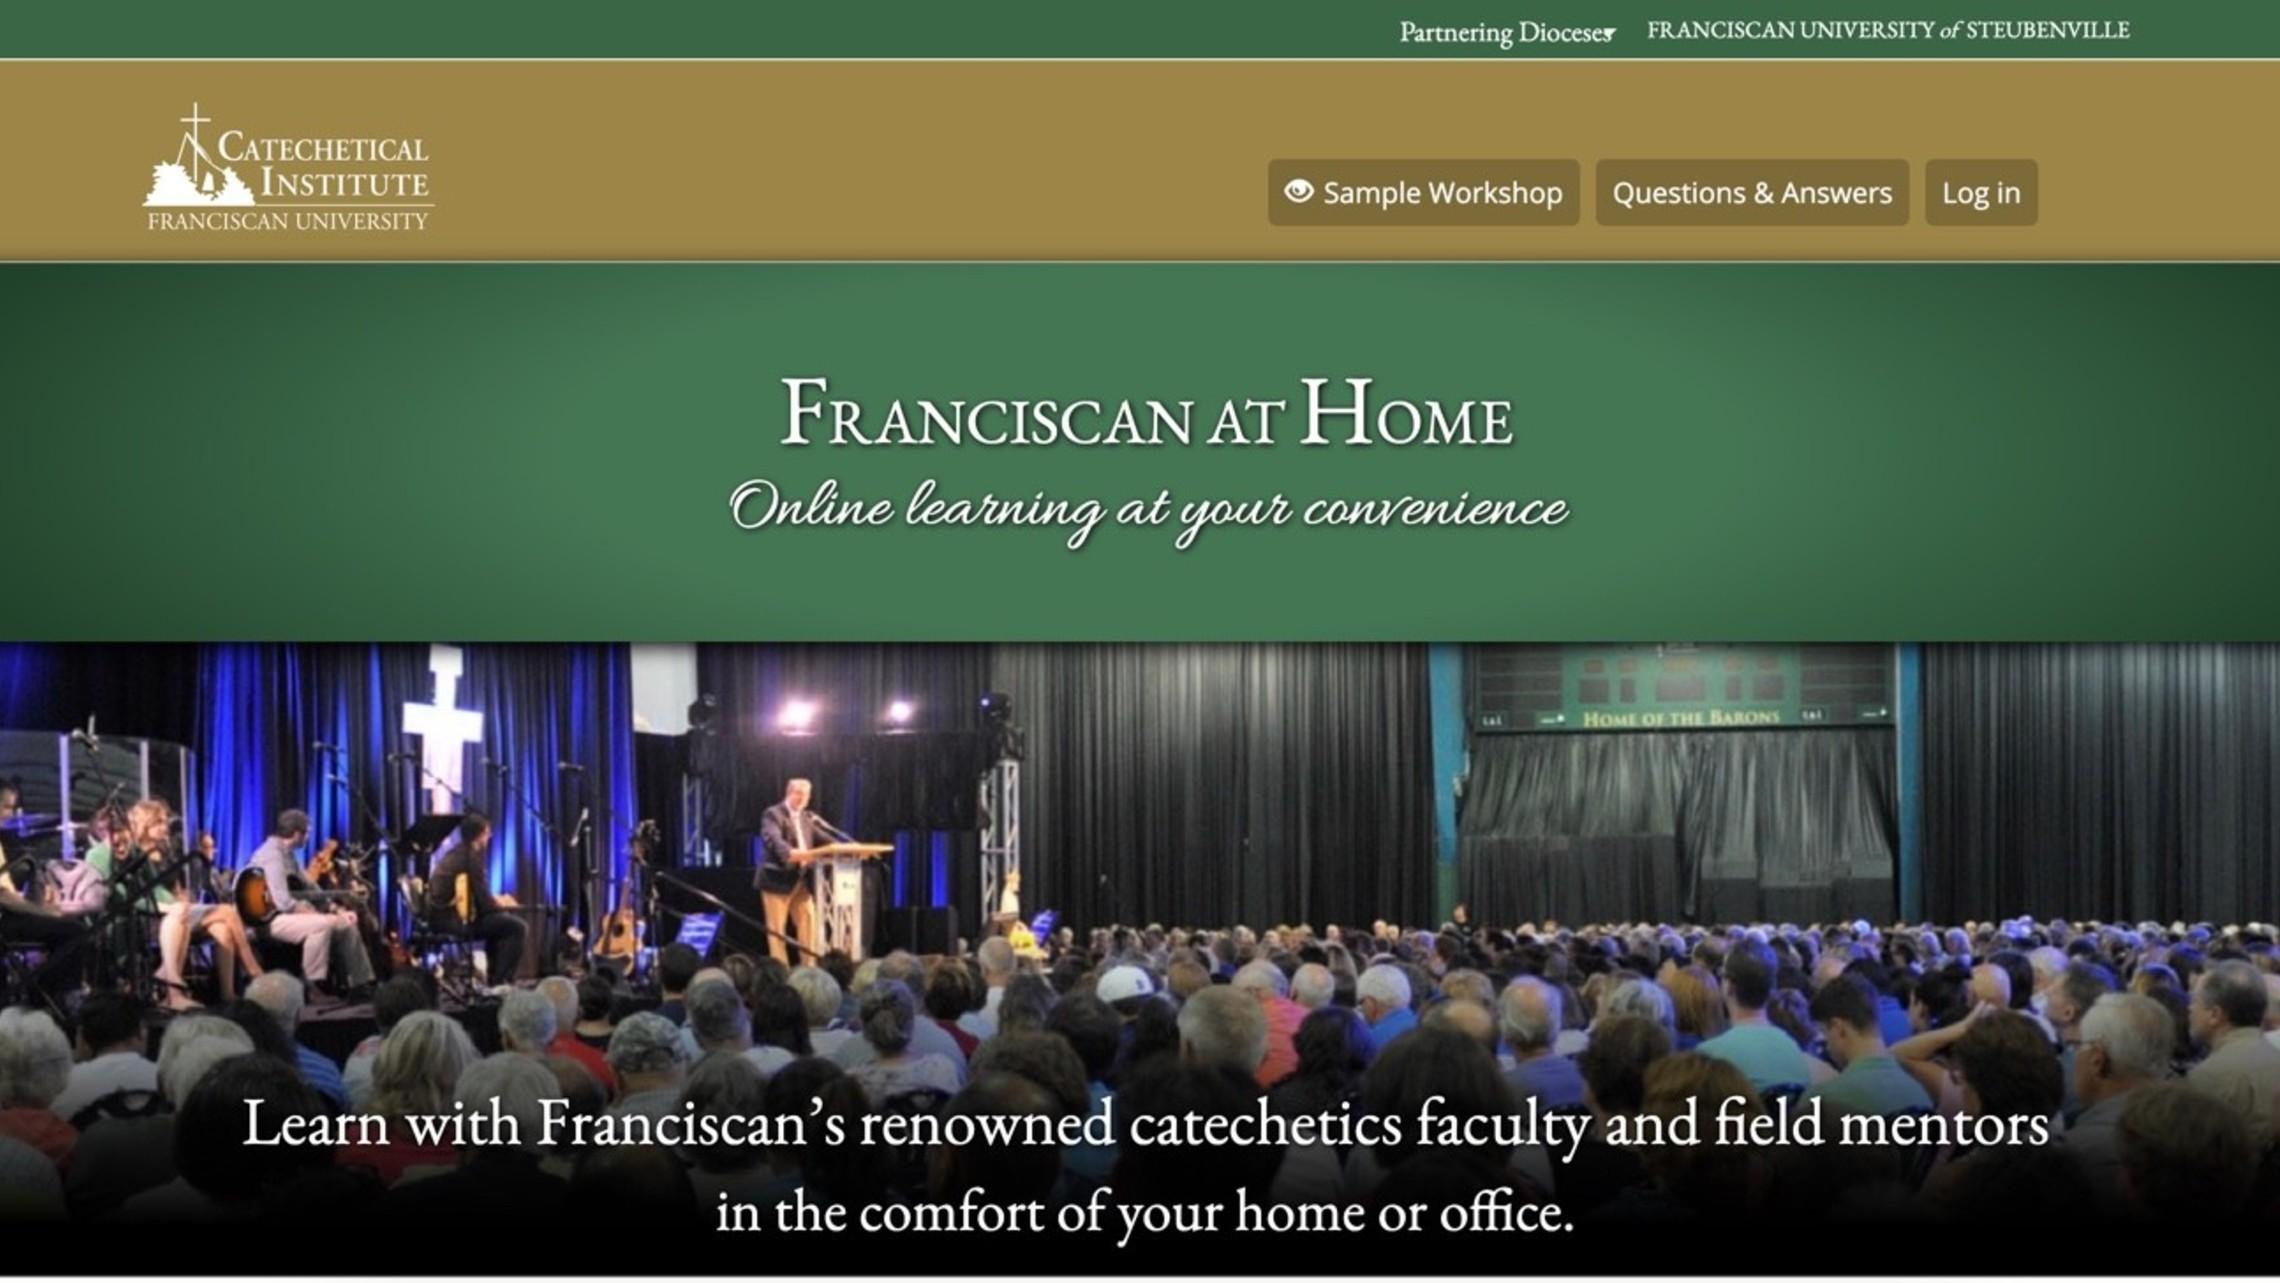 Franciscanathome